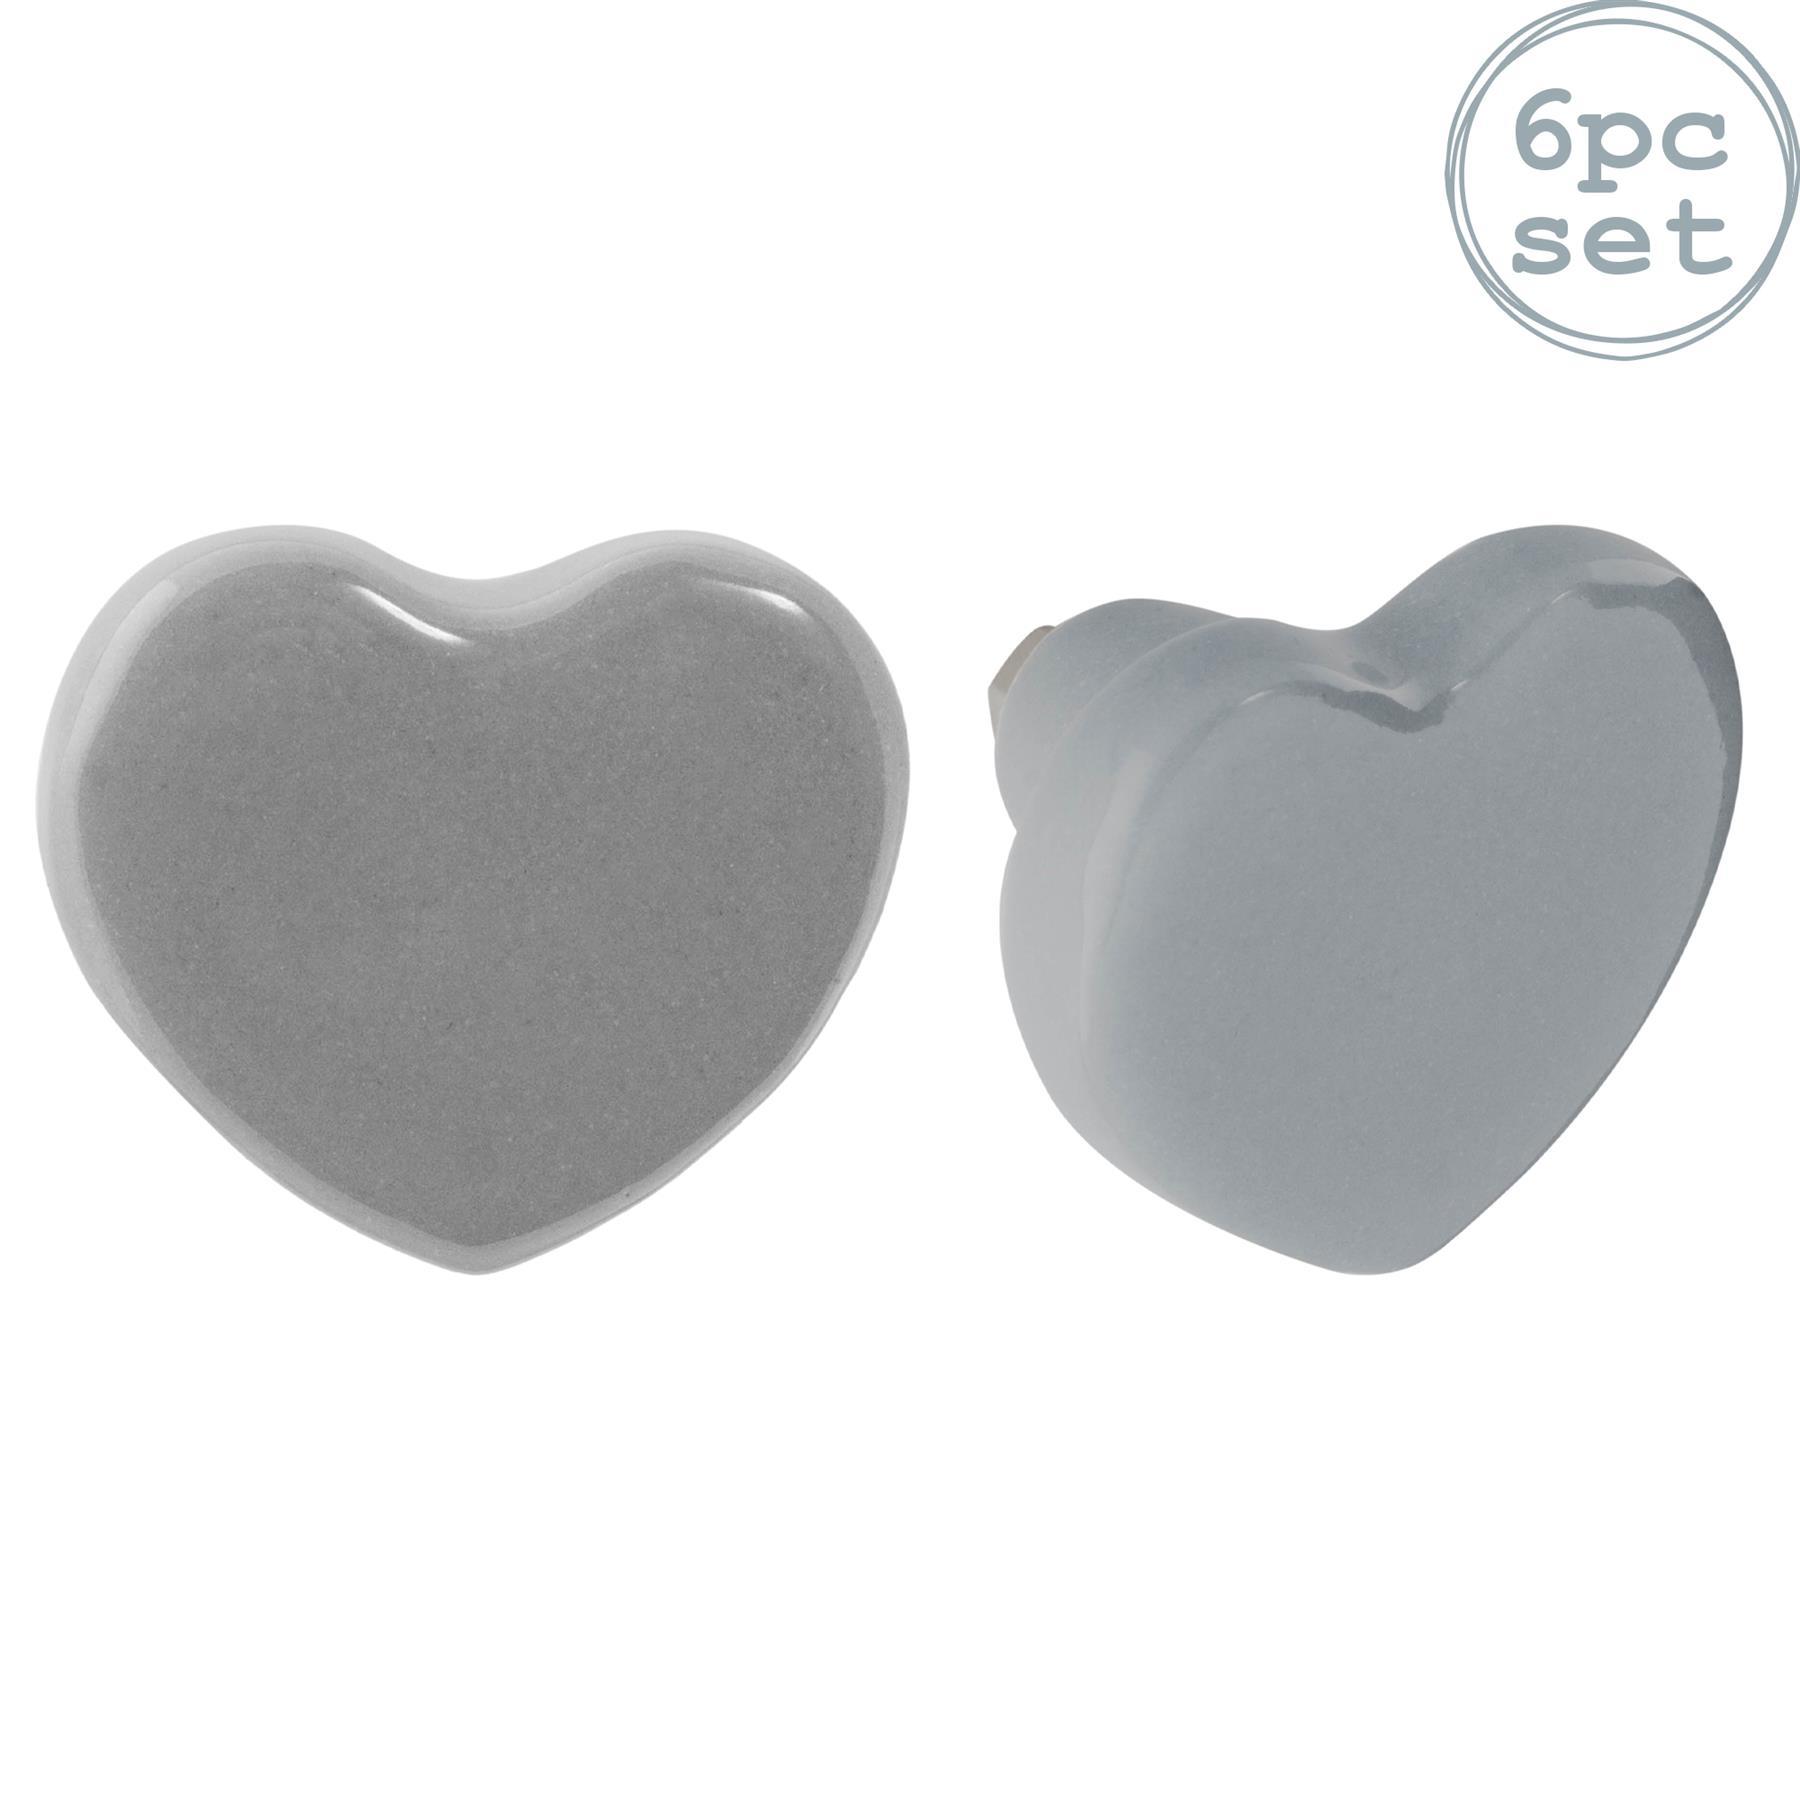 heart Print White Cabinet Decorative Door Handle Dresser Drawer or Bureau Pull Set of 6 Ceramic Knob/'Love Out/' Furniture Cupboard Handle